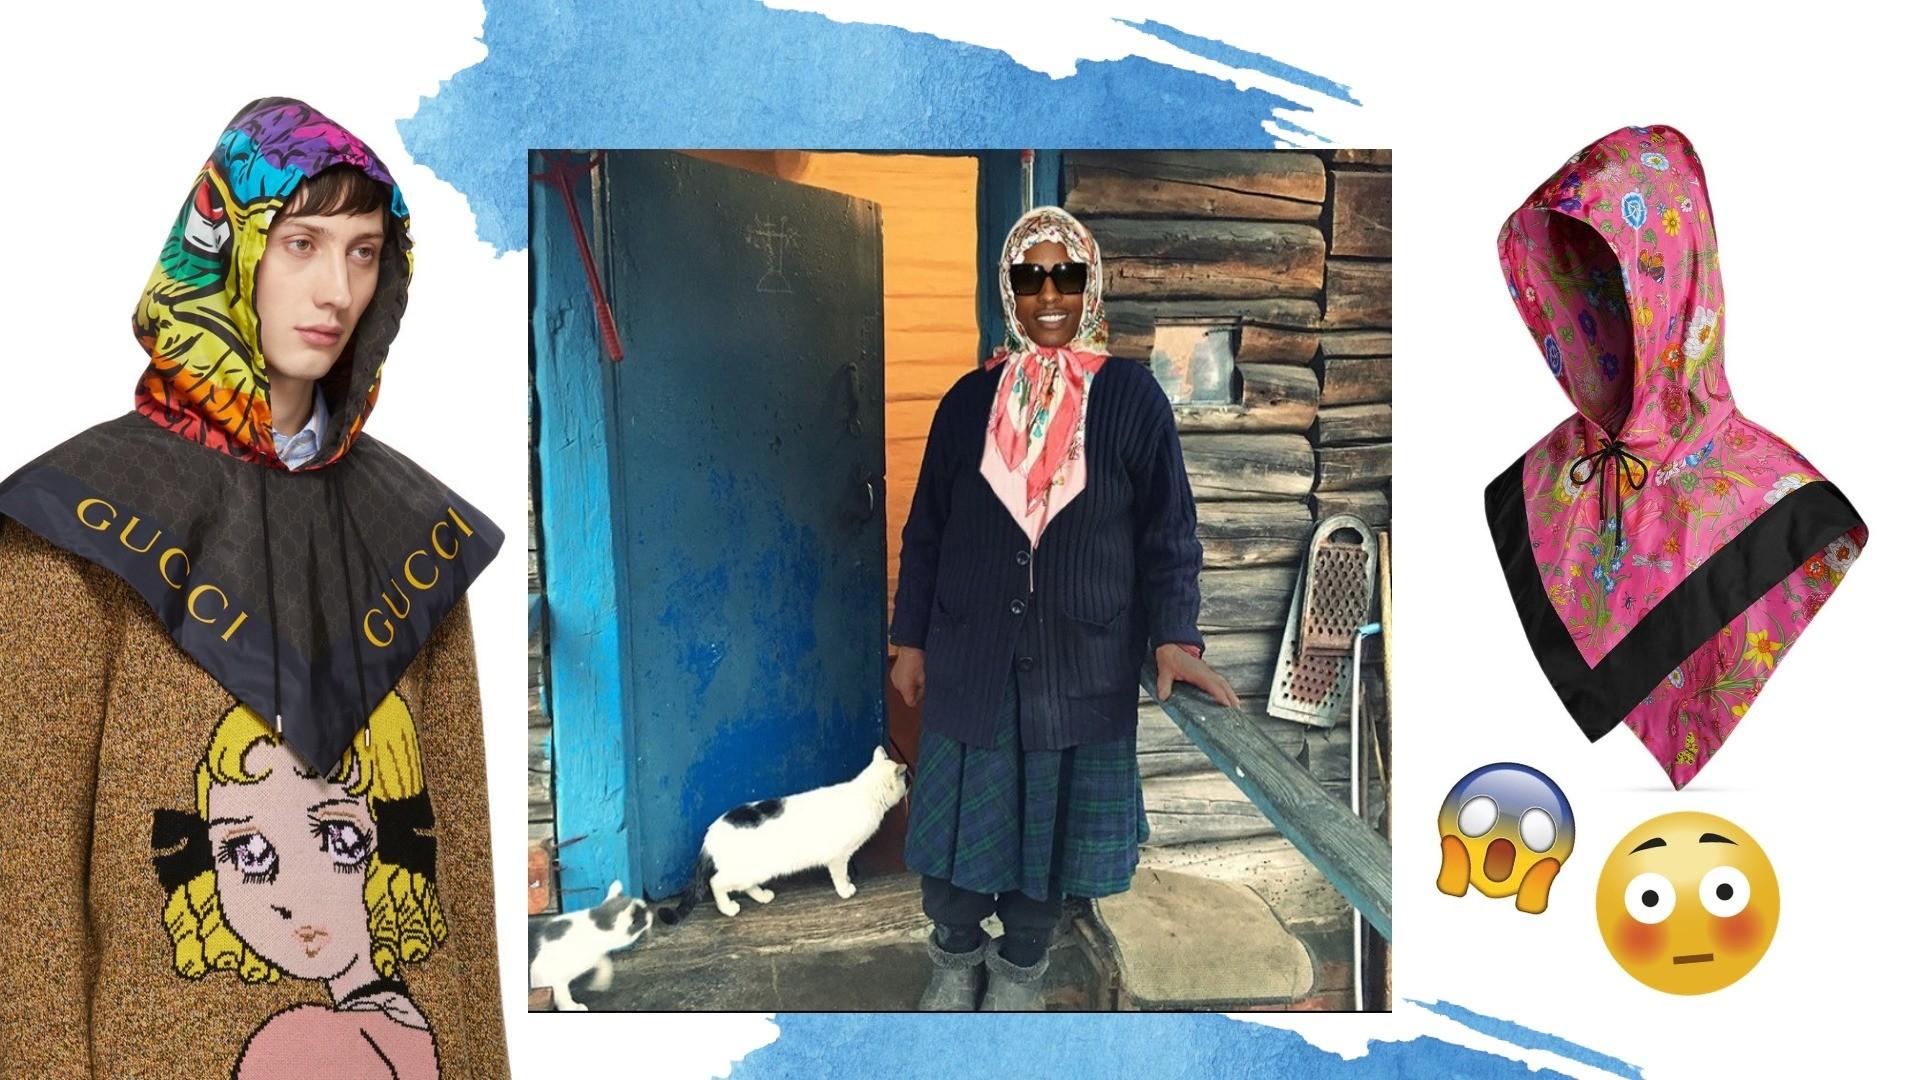 Бабушка-стайл: модные мужчины повязывают на голову косынки